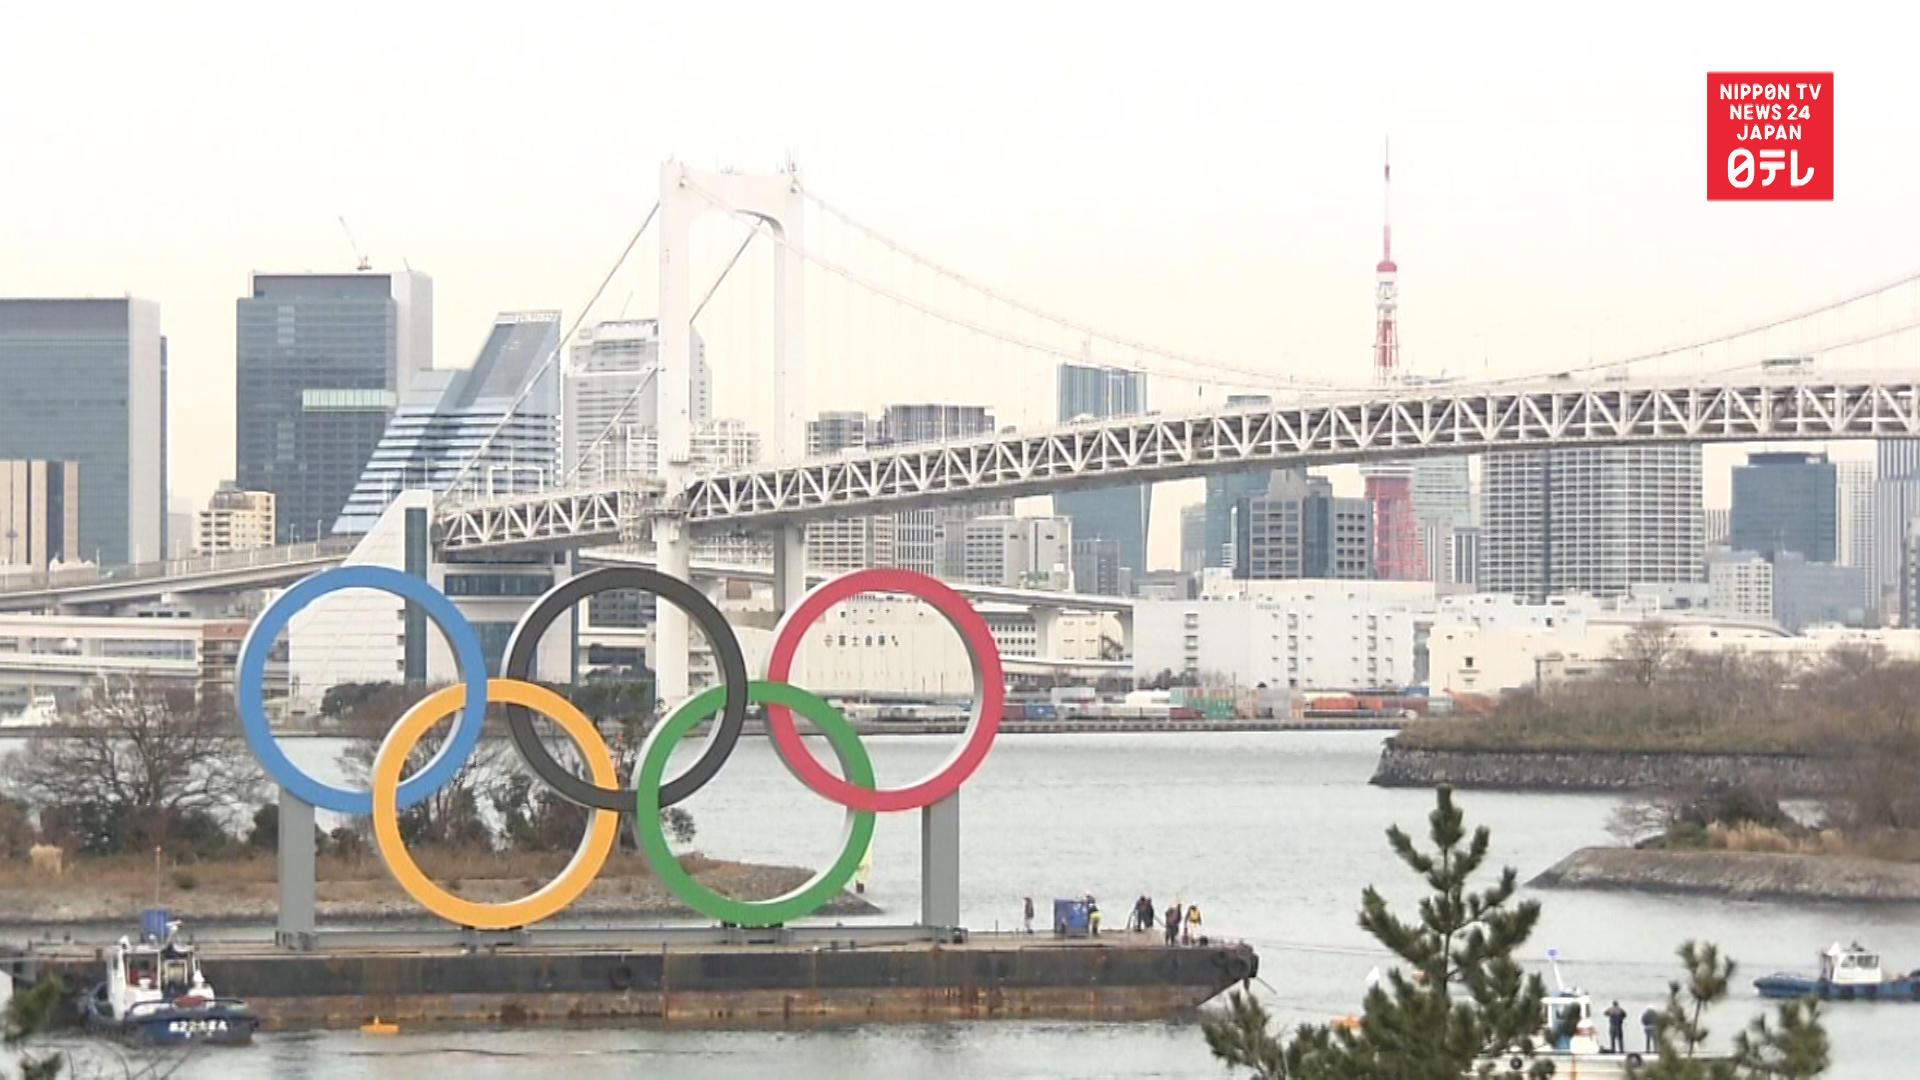 Giant Olympic emblem on Tokyo Bay